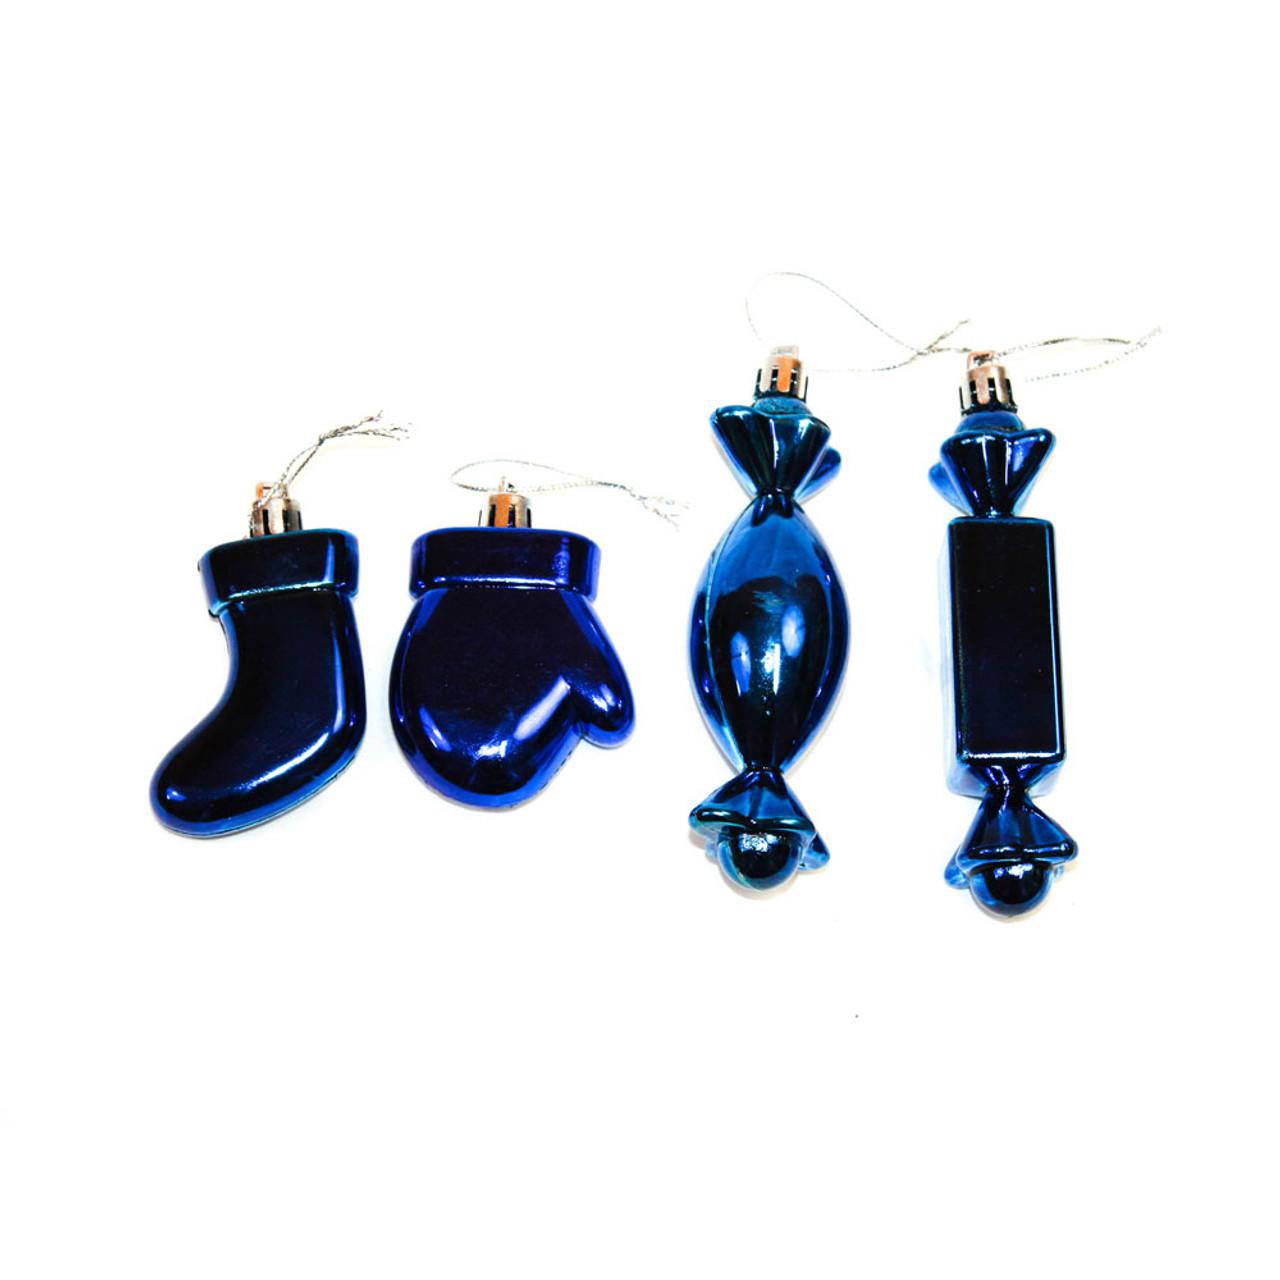 Blue Shatterproof Christmas Ornaments